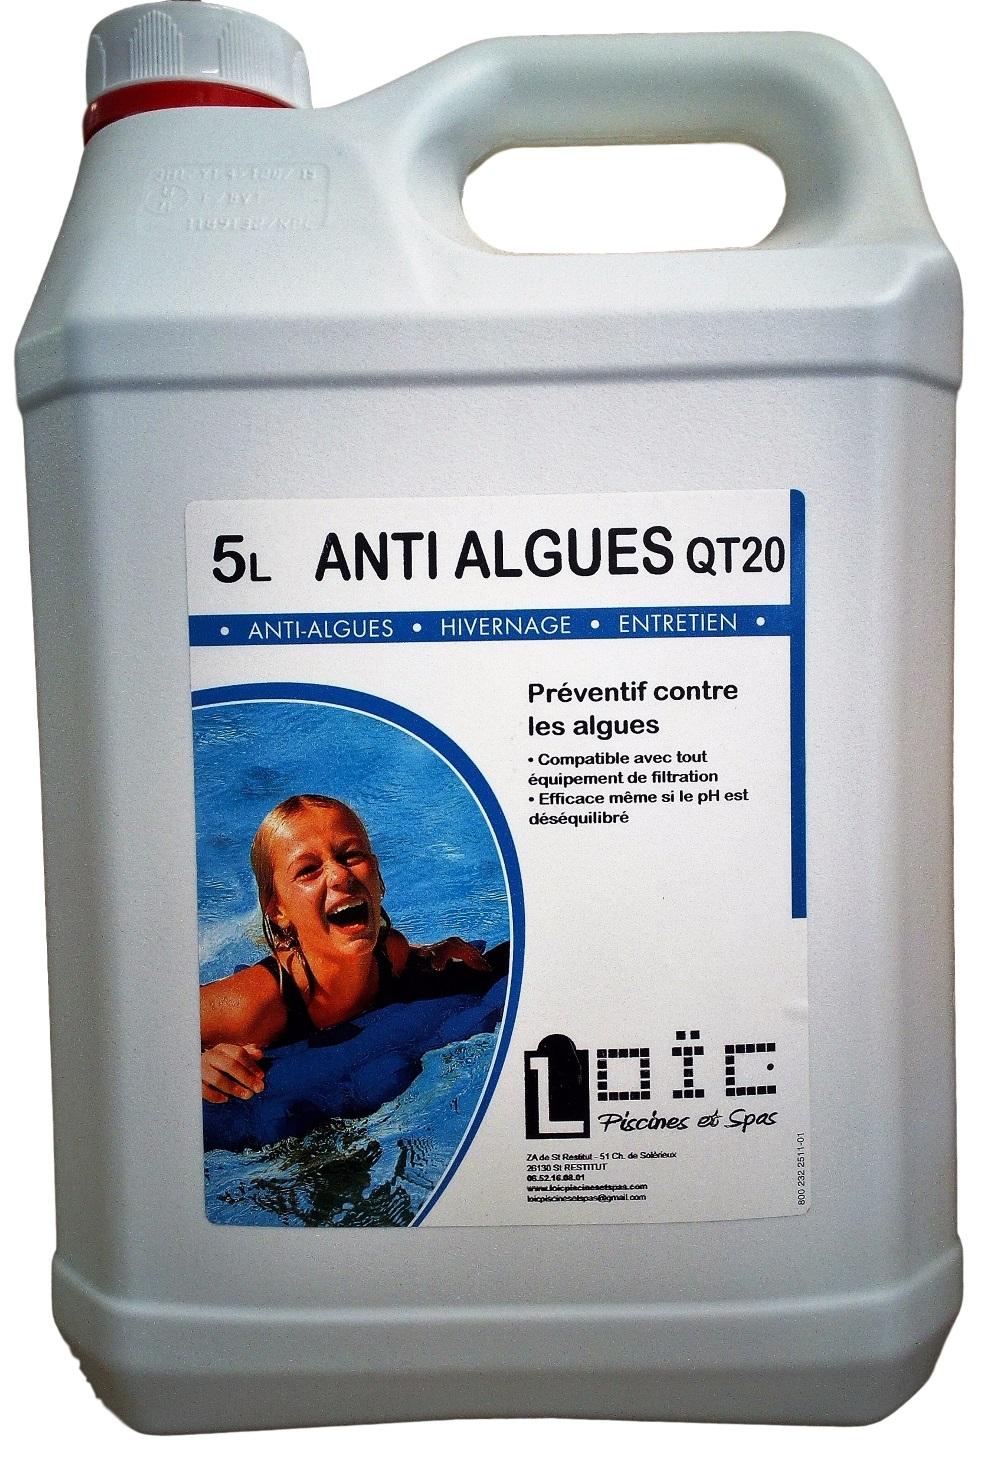 Antialgues loic piscines et spas - Anti algues piscine sulfate de cuivre ...